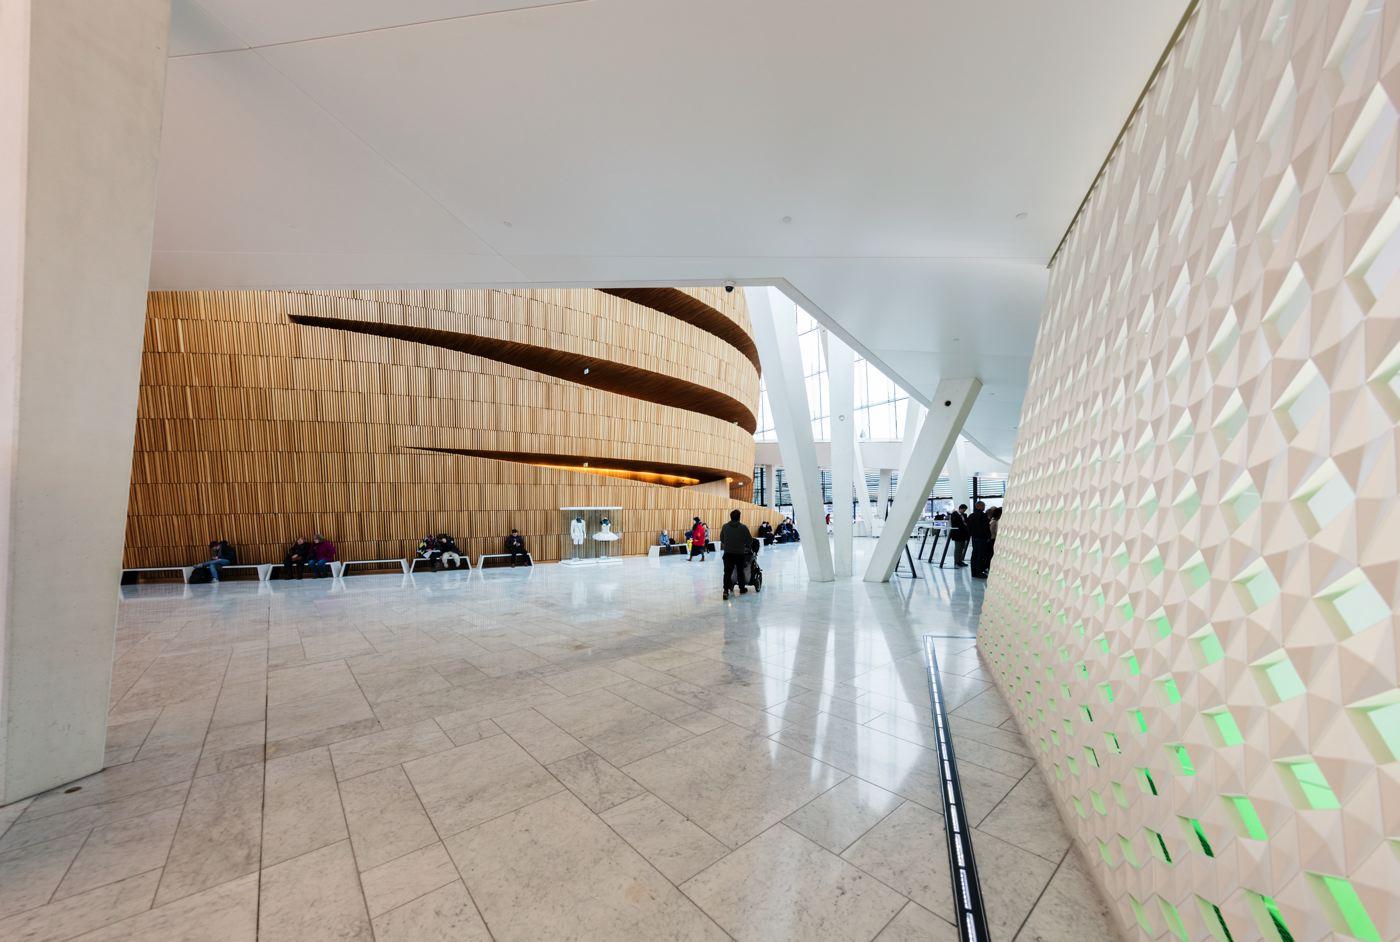 LDKphoto-Oslo-Opera-house-13.jpg